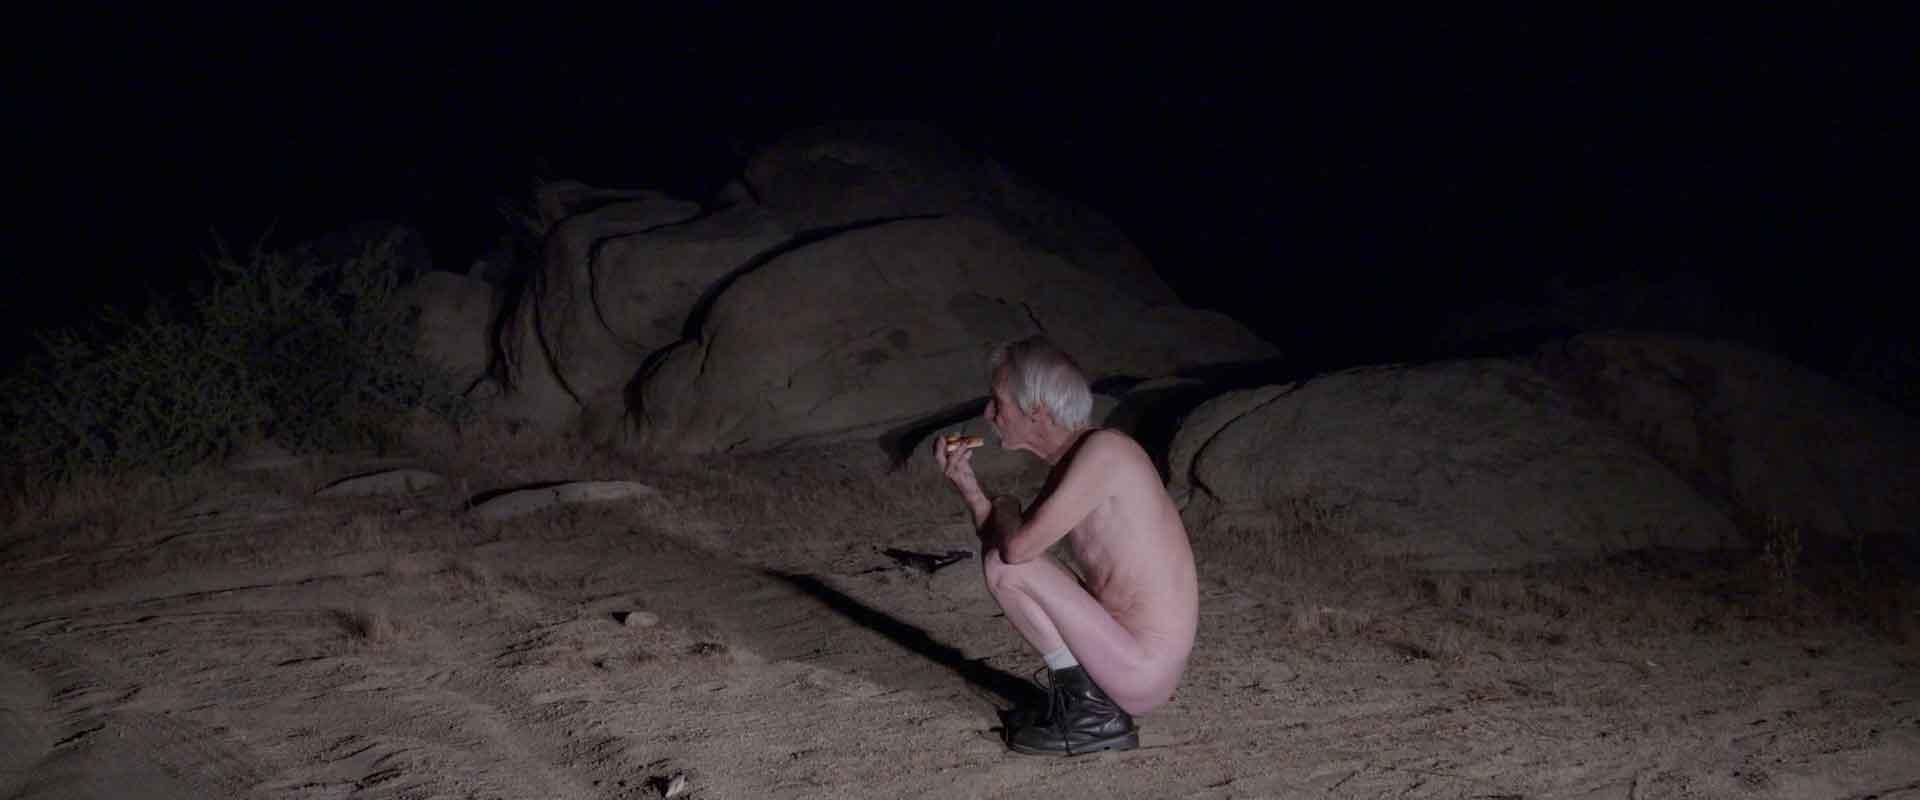 Night // Odin Wadleigh